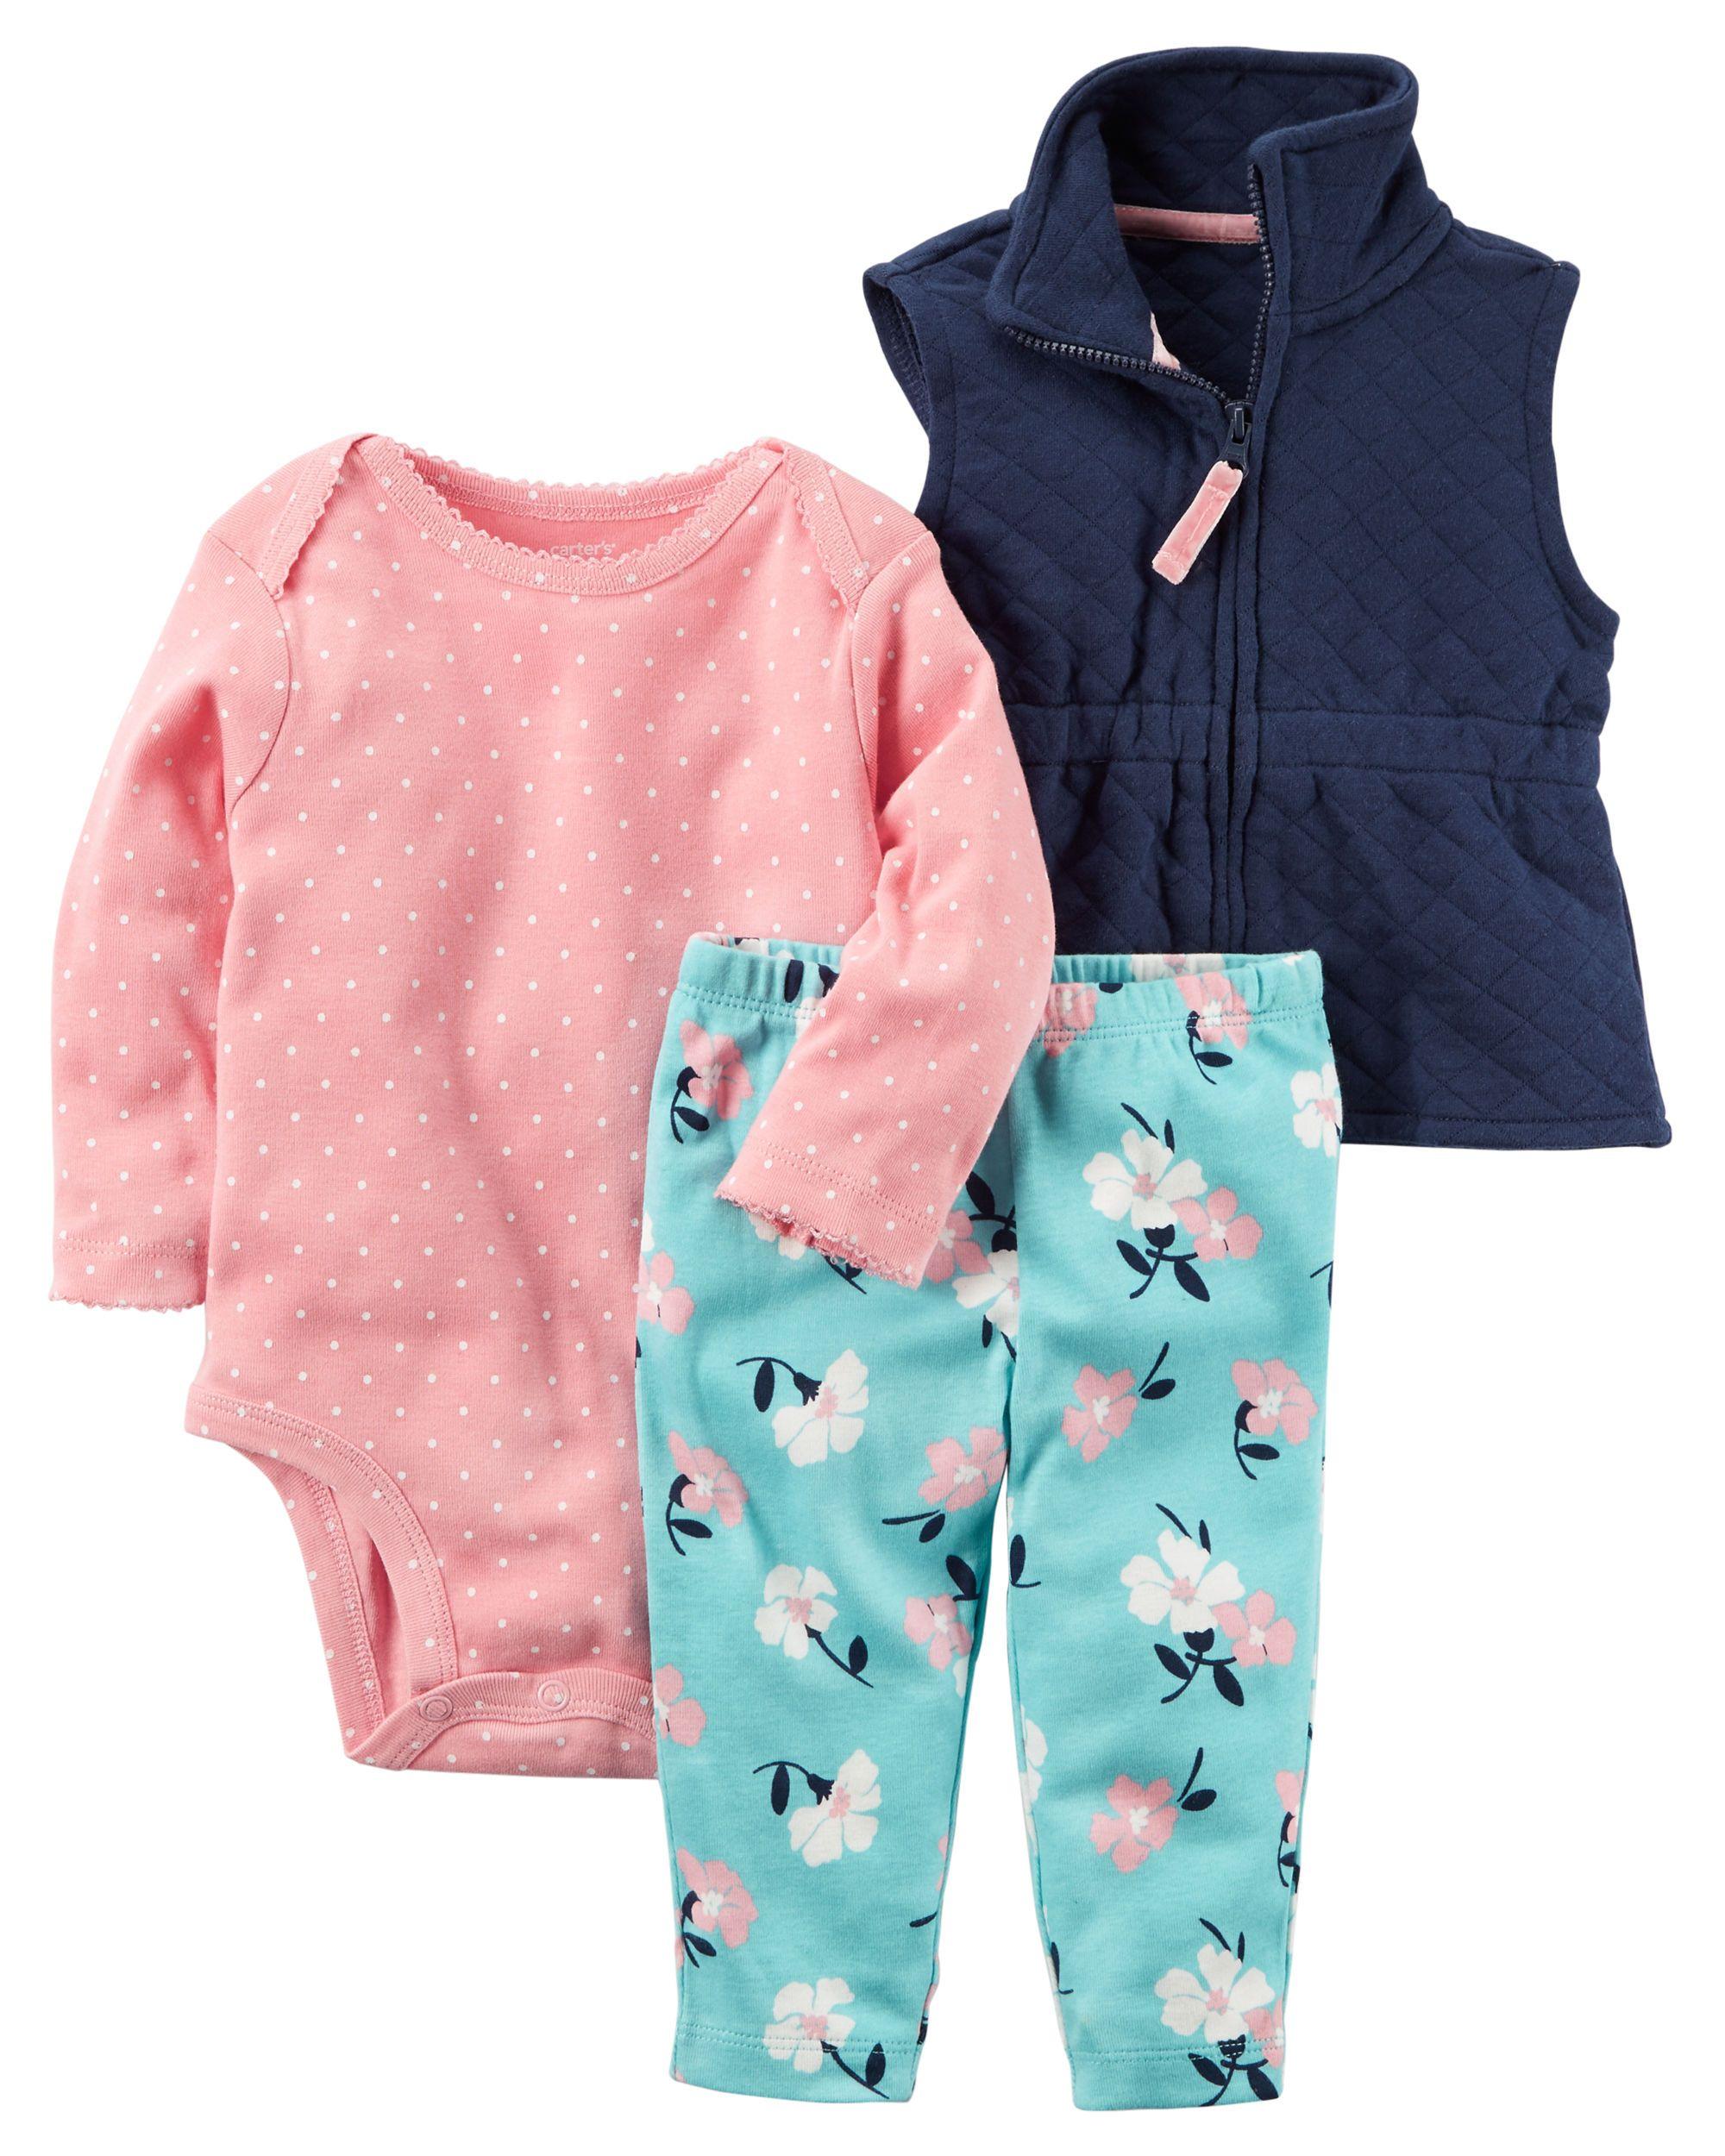 ef8253bab 3-Piece Little Vest Set | Carters.com | Kids Fashion I like ...